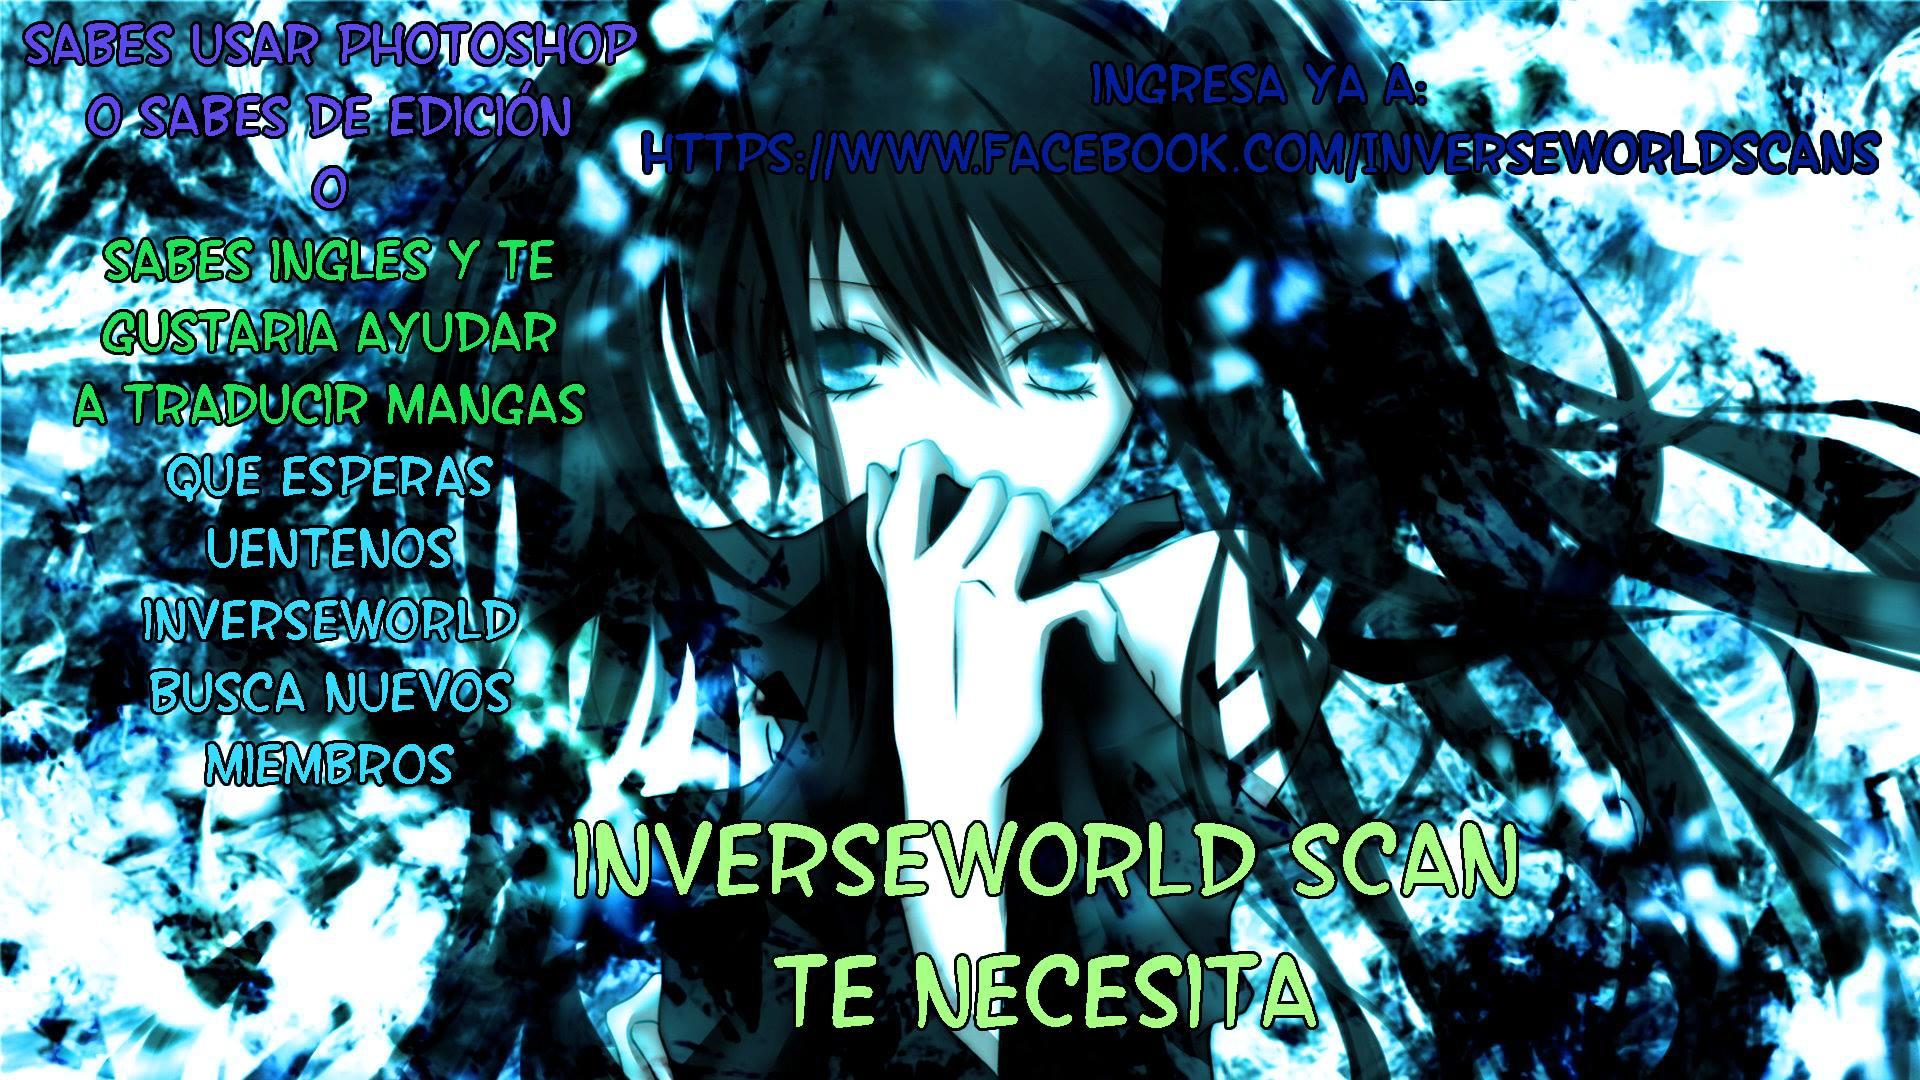 http://c5.ninemanga.com/es_manga/18/16210/415320/87d0df35ea2d504fa30f81e84acb8ef4.jpg Page 2